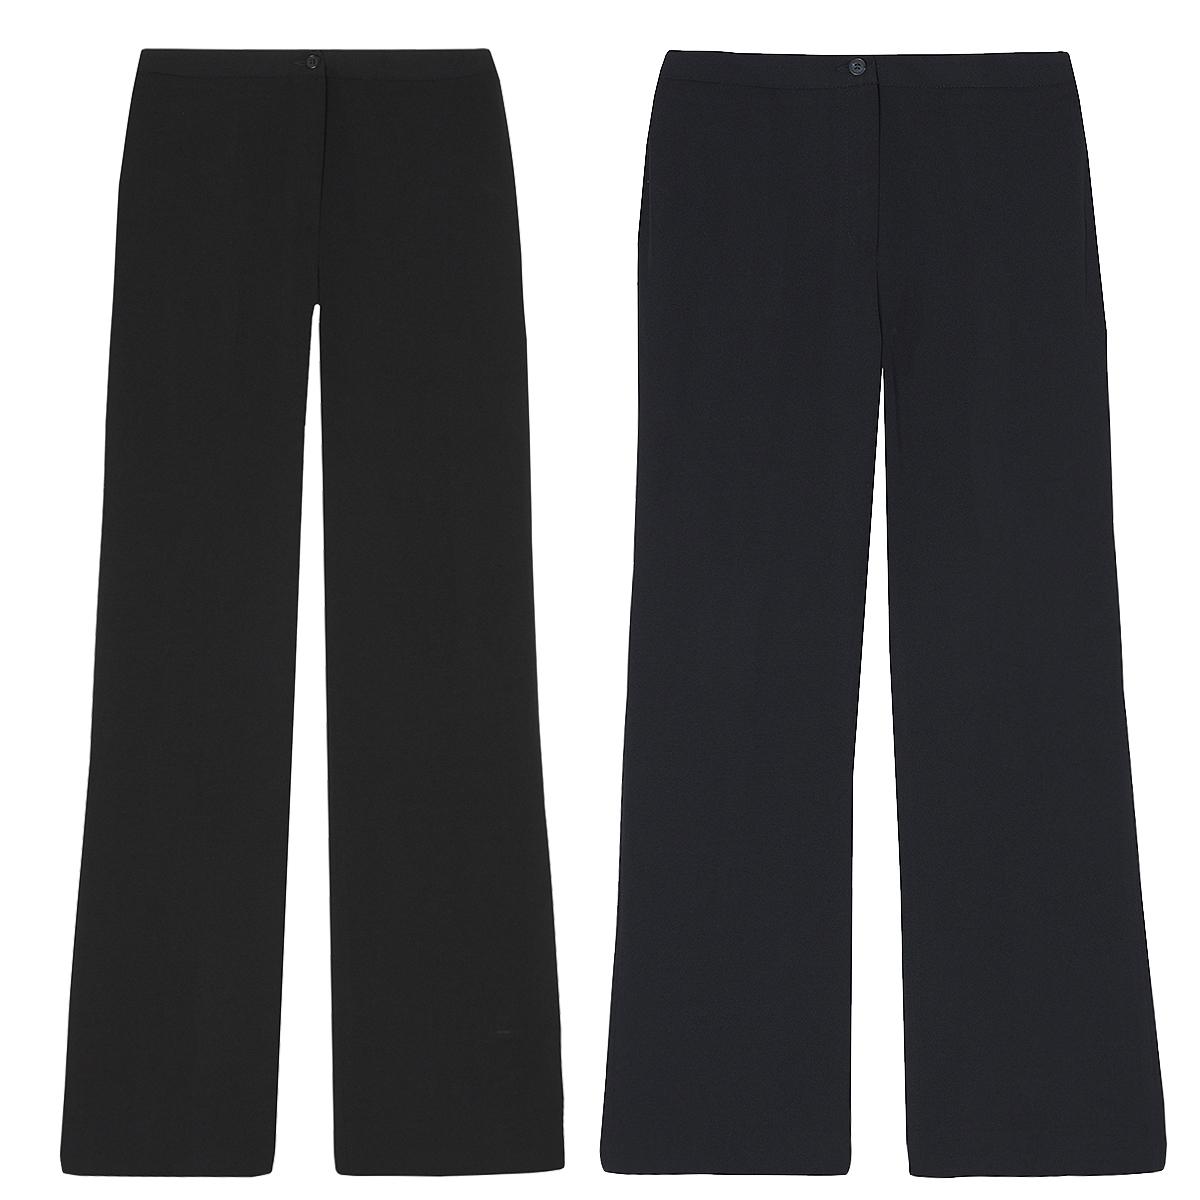 5a01a7d0bcc193 Ladies Womens Boot Cut Trousers Straight Leg Work Pants Office Smart Plain  Light